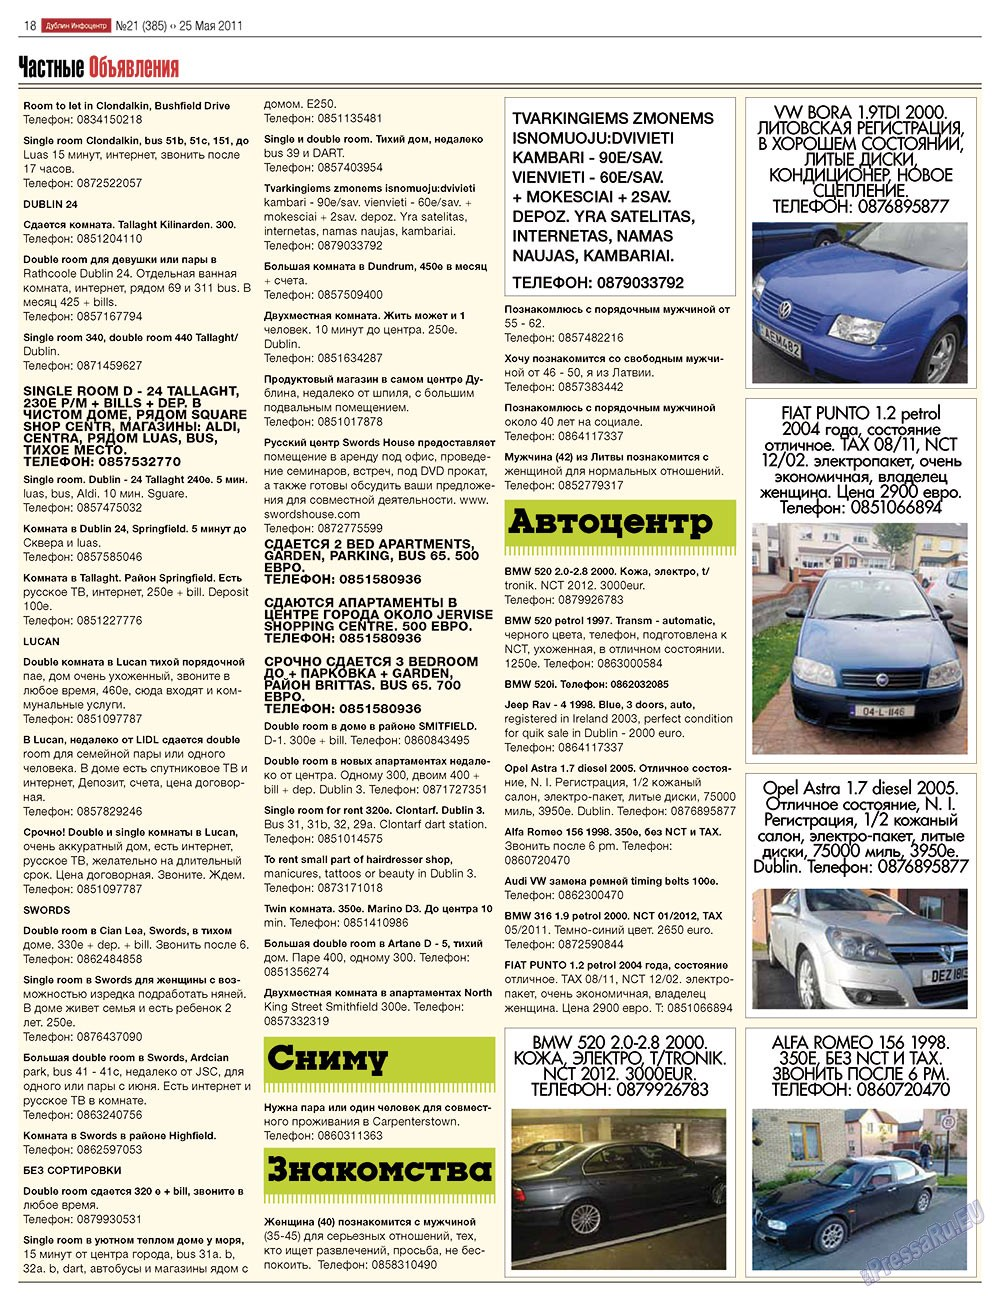 Дублин инфоцентр (газета). 2011 год, номер 21, стр. 18